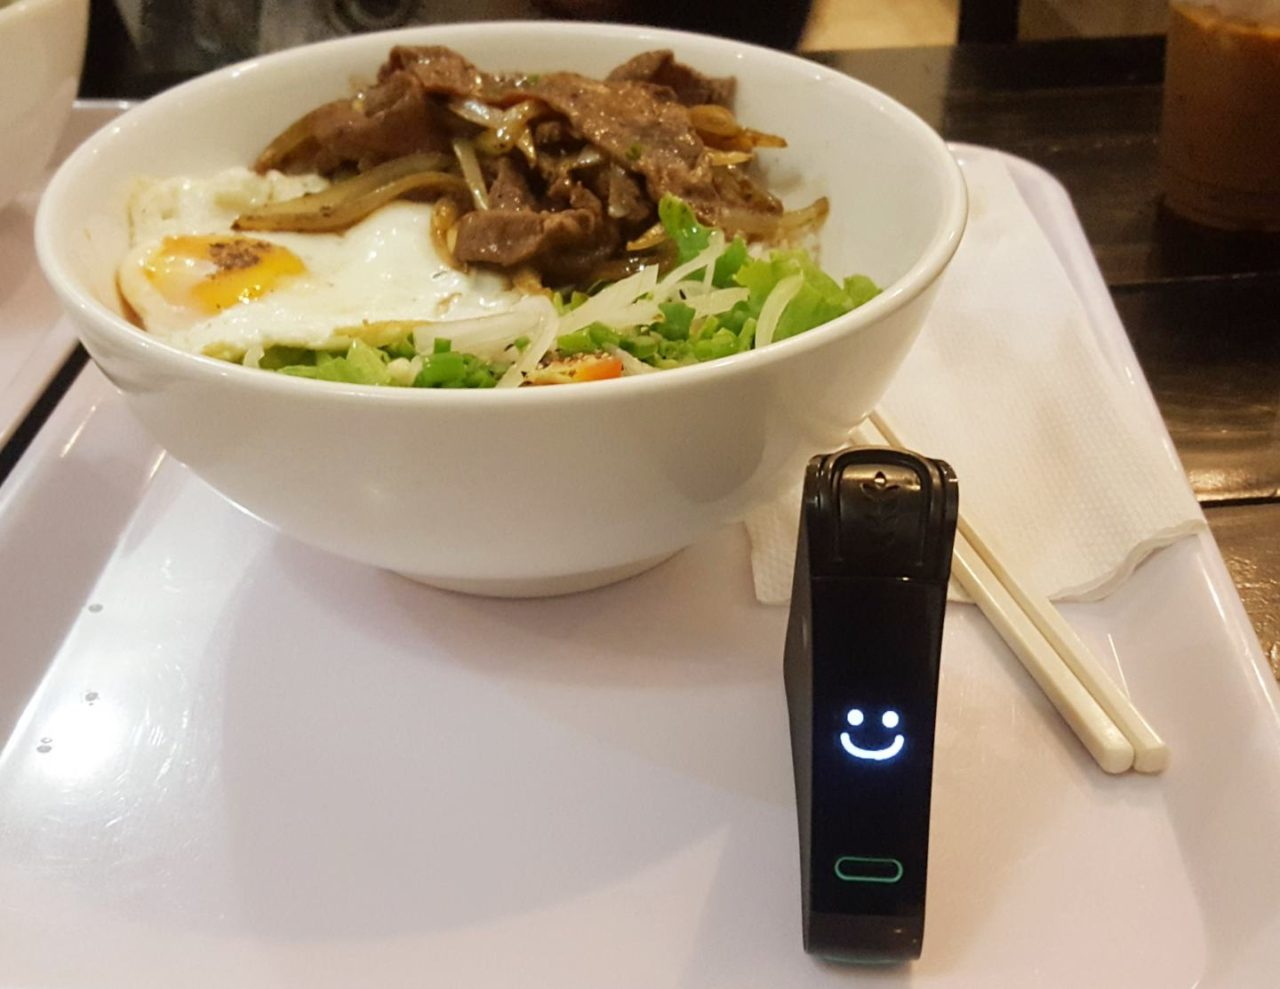 Testing with Nima Gluten Sensor